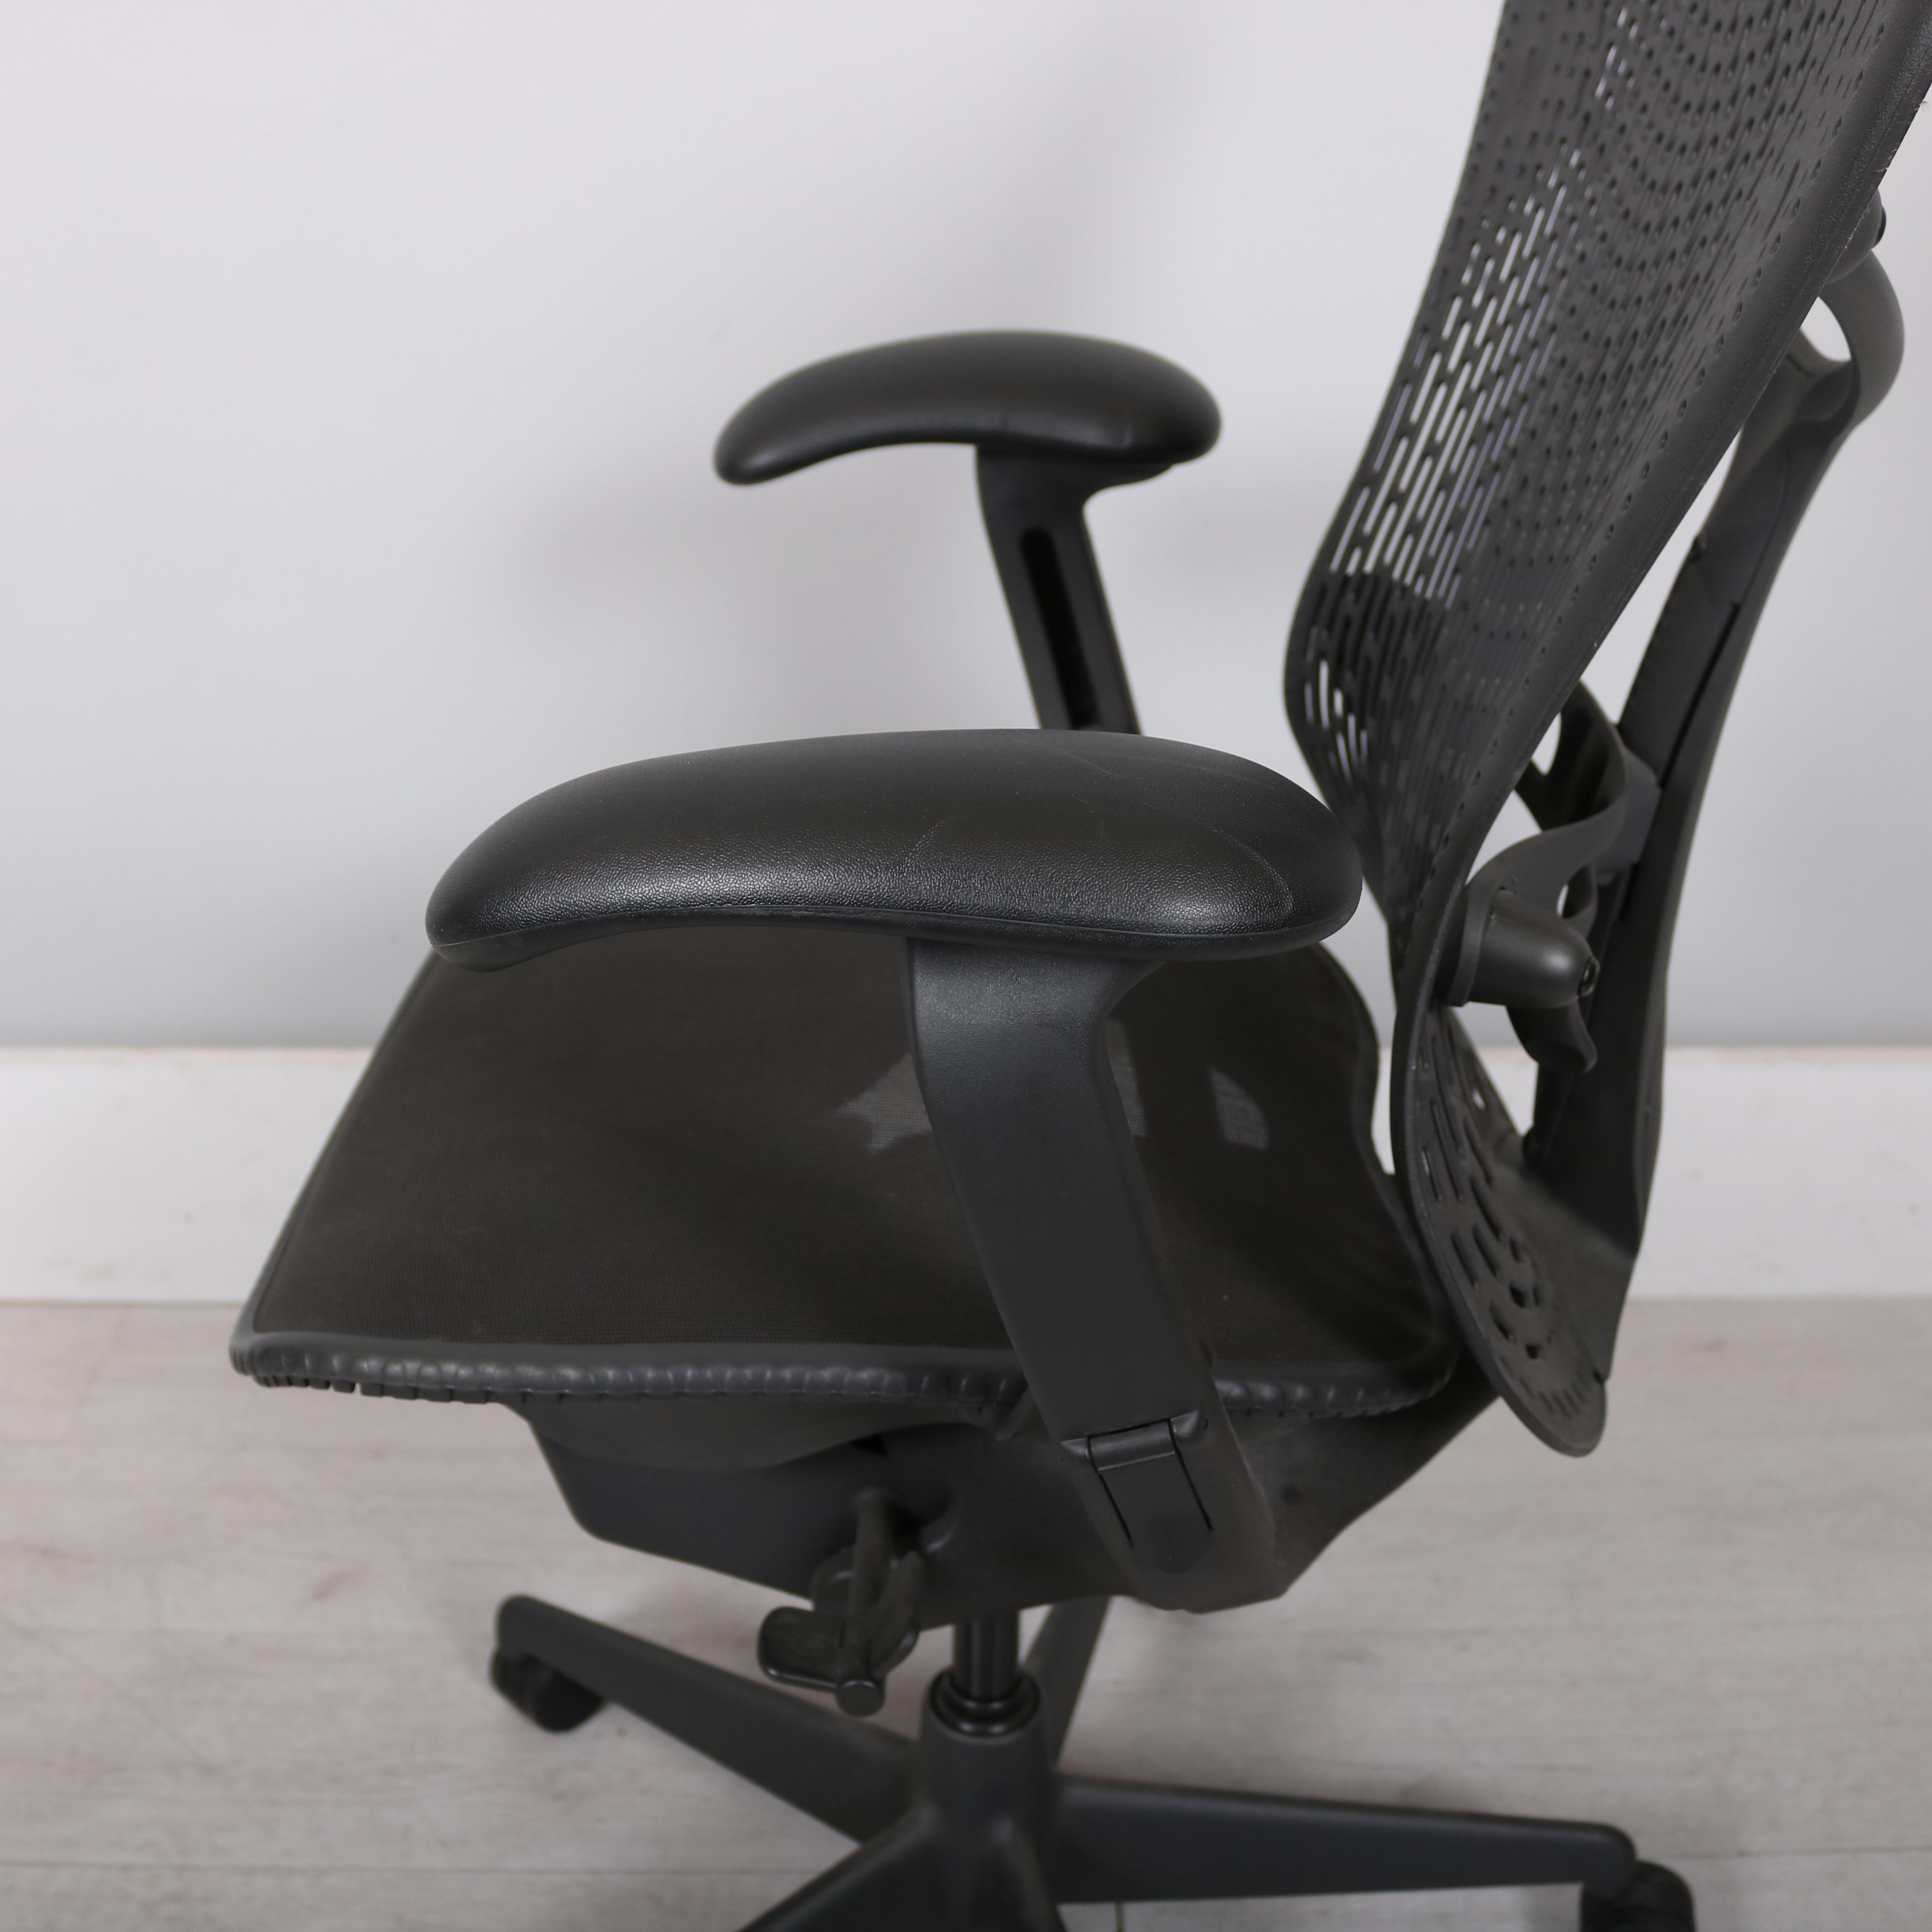 herman miller mirra chair img6625 img6626 img6627 img6628 img6629 img6630